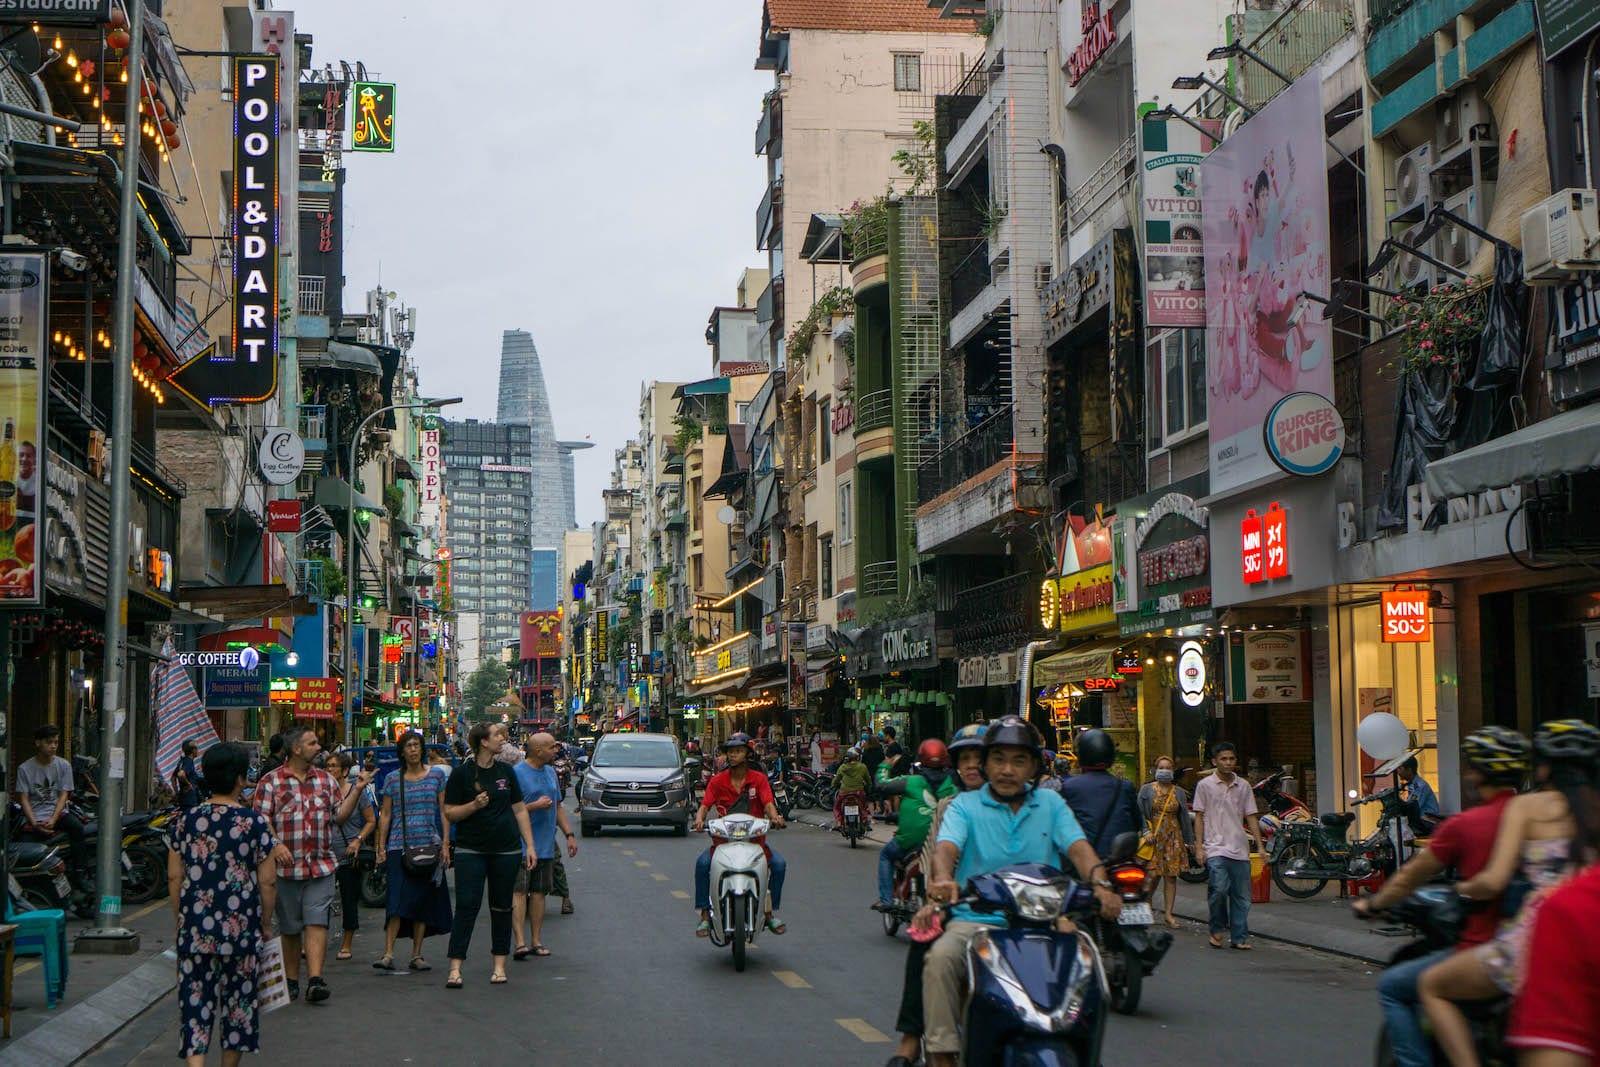 Image of the Bui Vien Street in Saigon